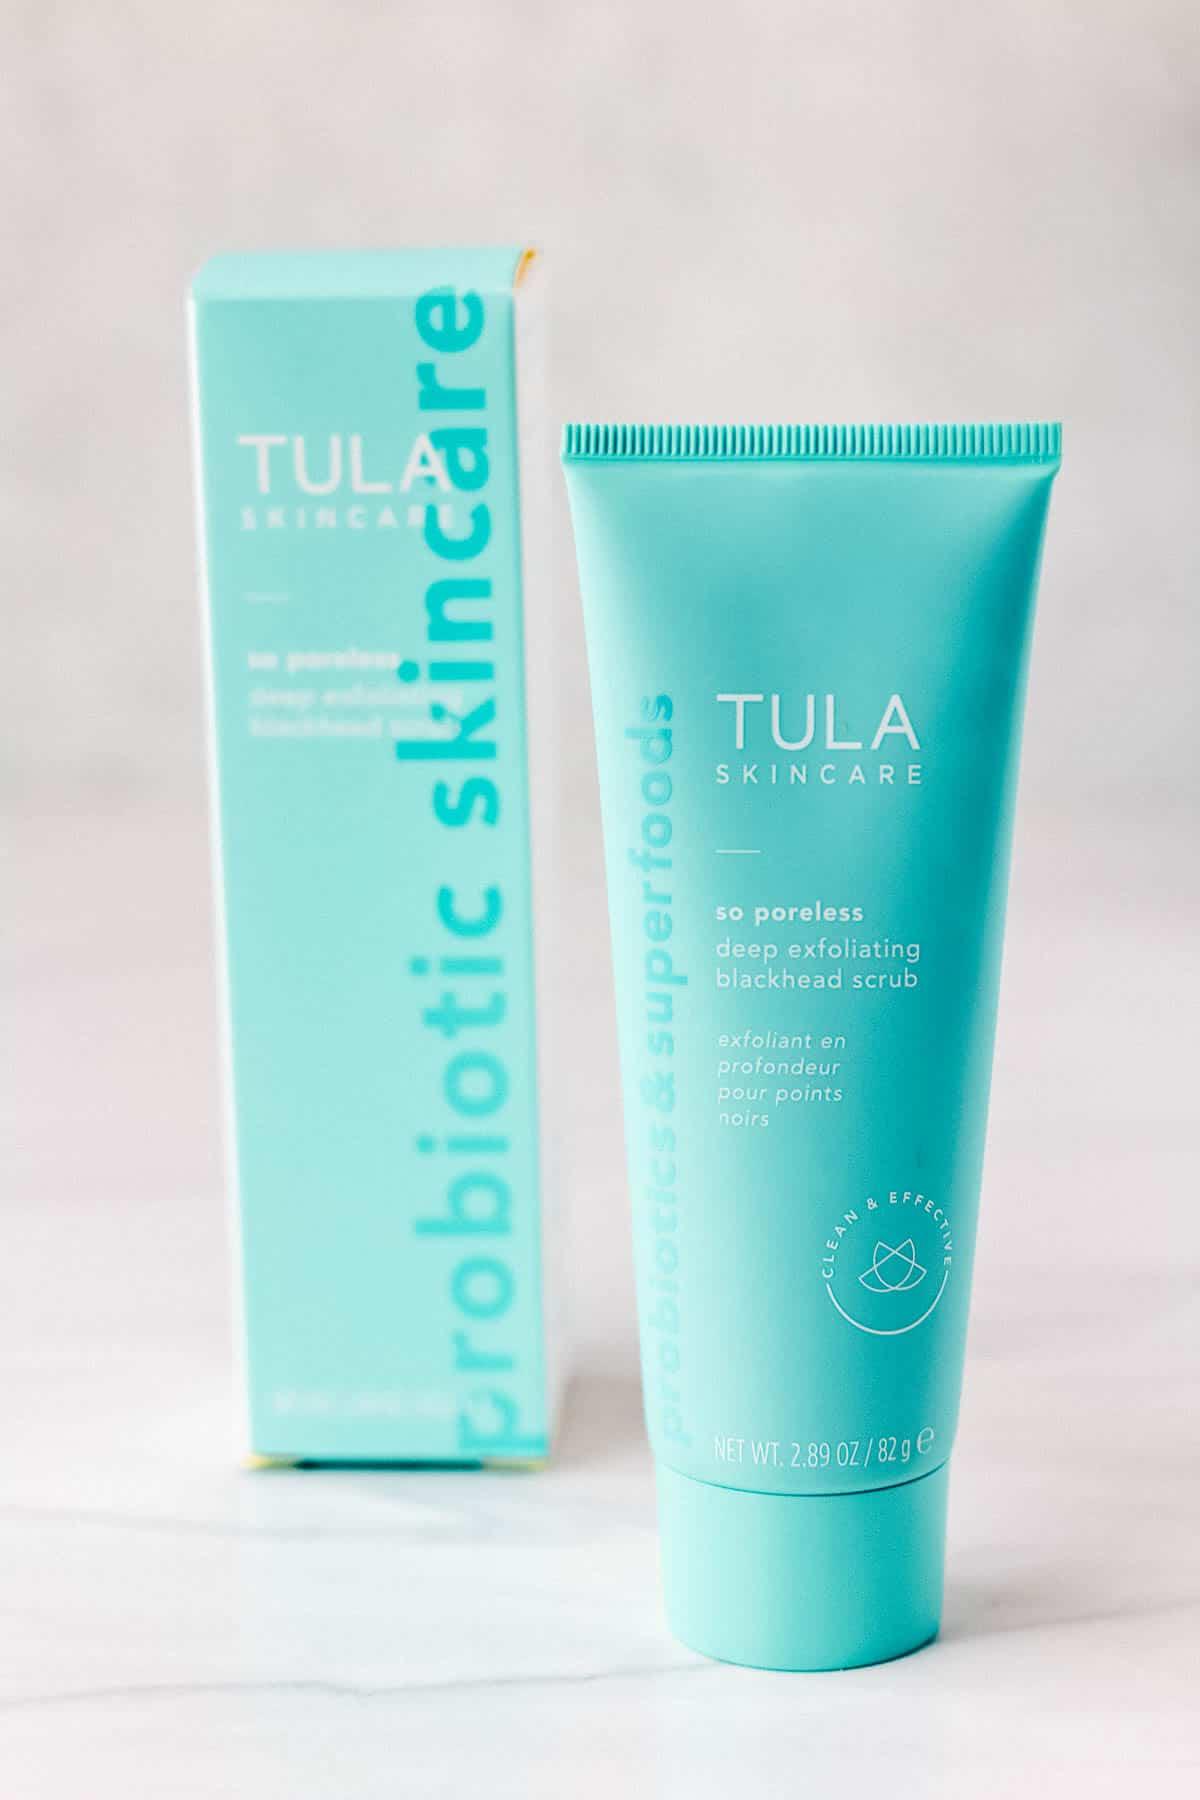 Tula Skincare So Poreless Deep Exfoliating Blackhead Scrub tube and box on a white background